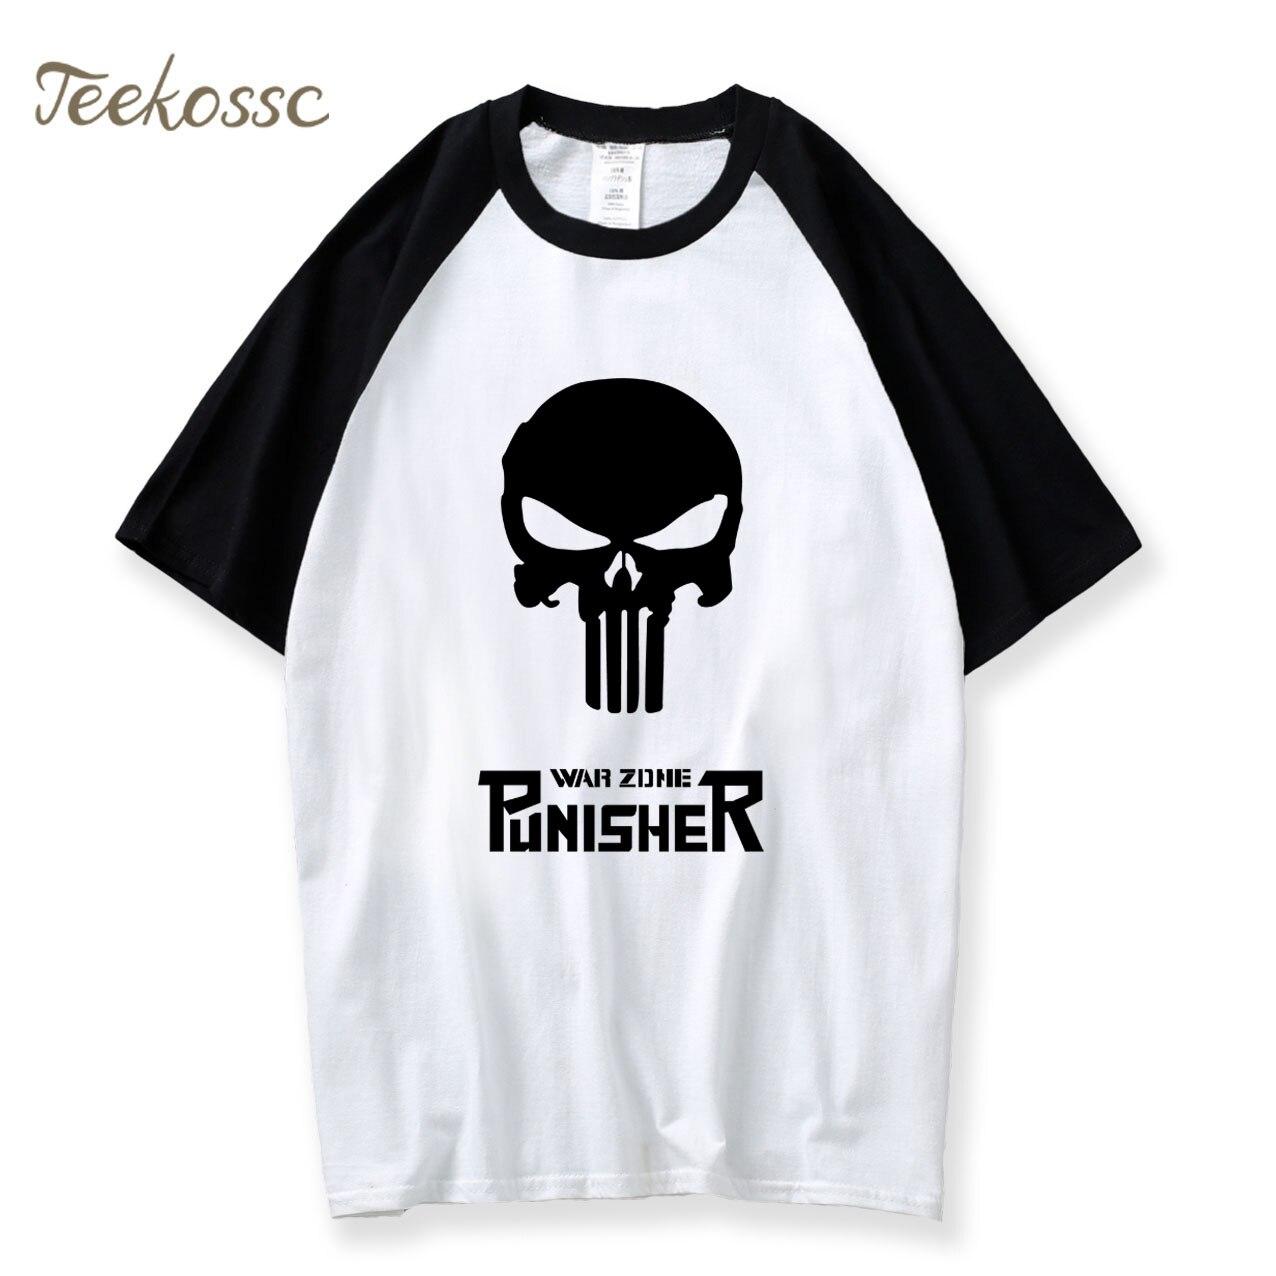 Superman T Shirt Skull Hip Hop Tshirt 2018 Summer Hipster Raglan Tshirts Men 100% Cotton Mens Punk Black Korean Fashion Clothing